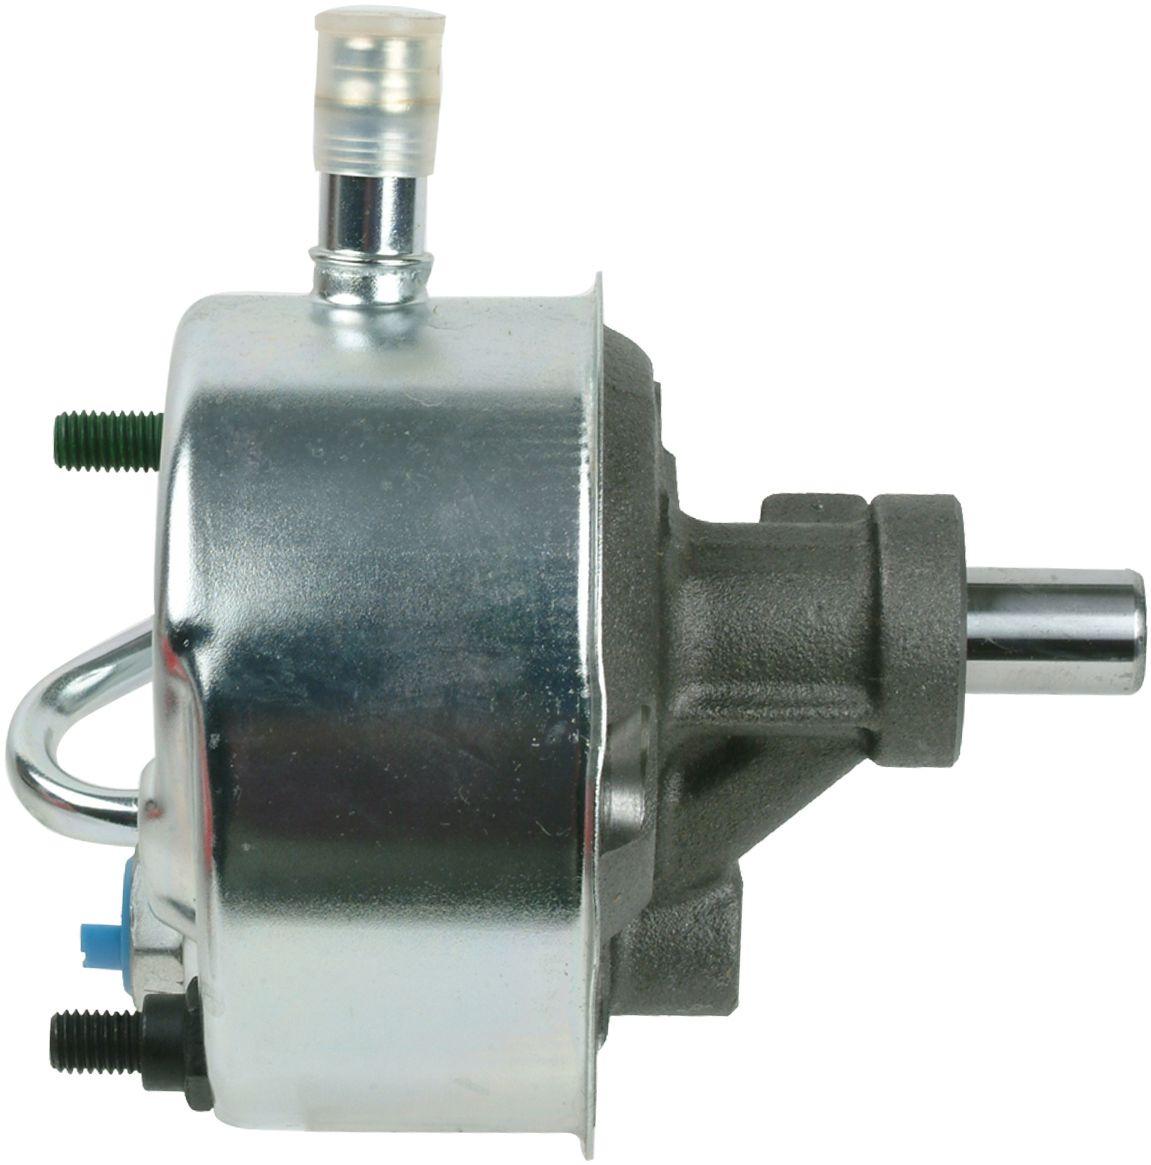 hight resolution of  1998 gmc safari power steering pump a1 96 8753